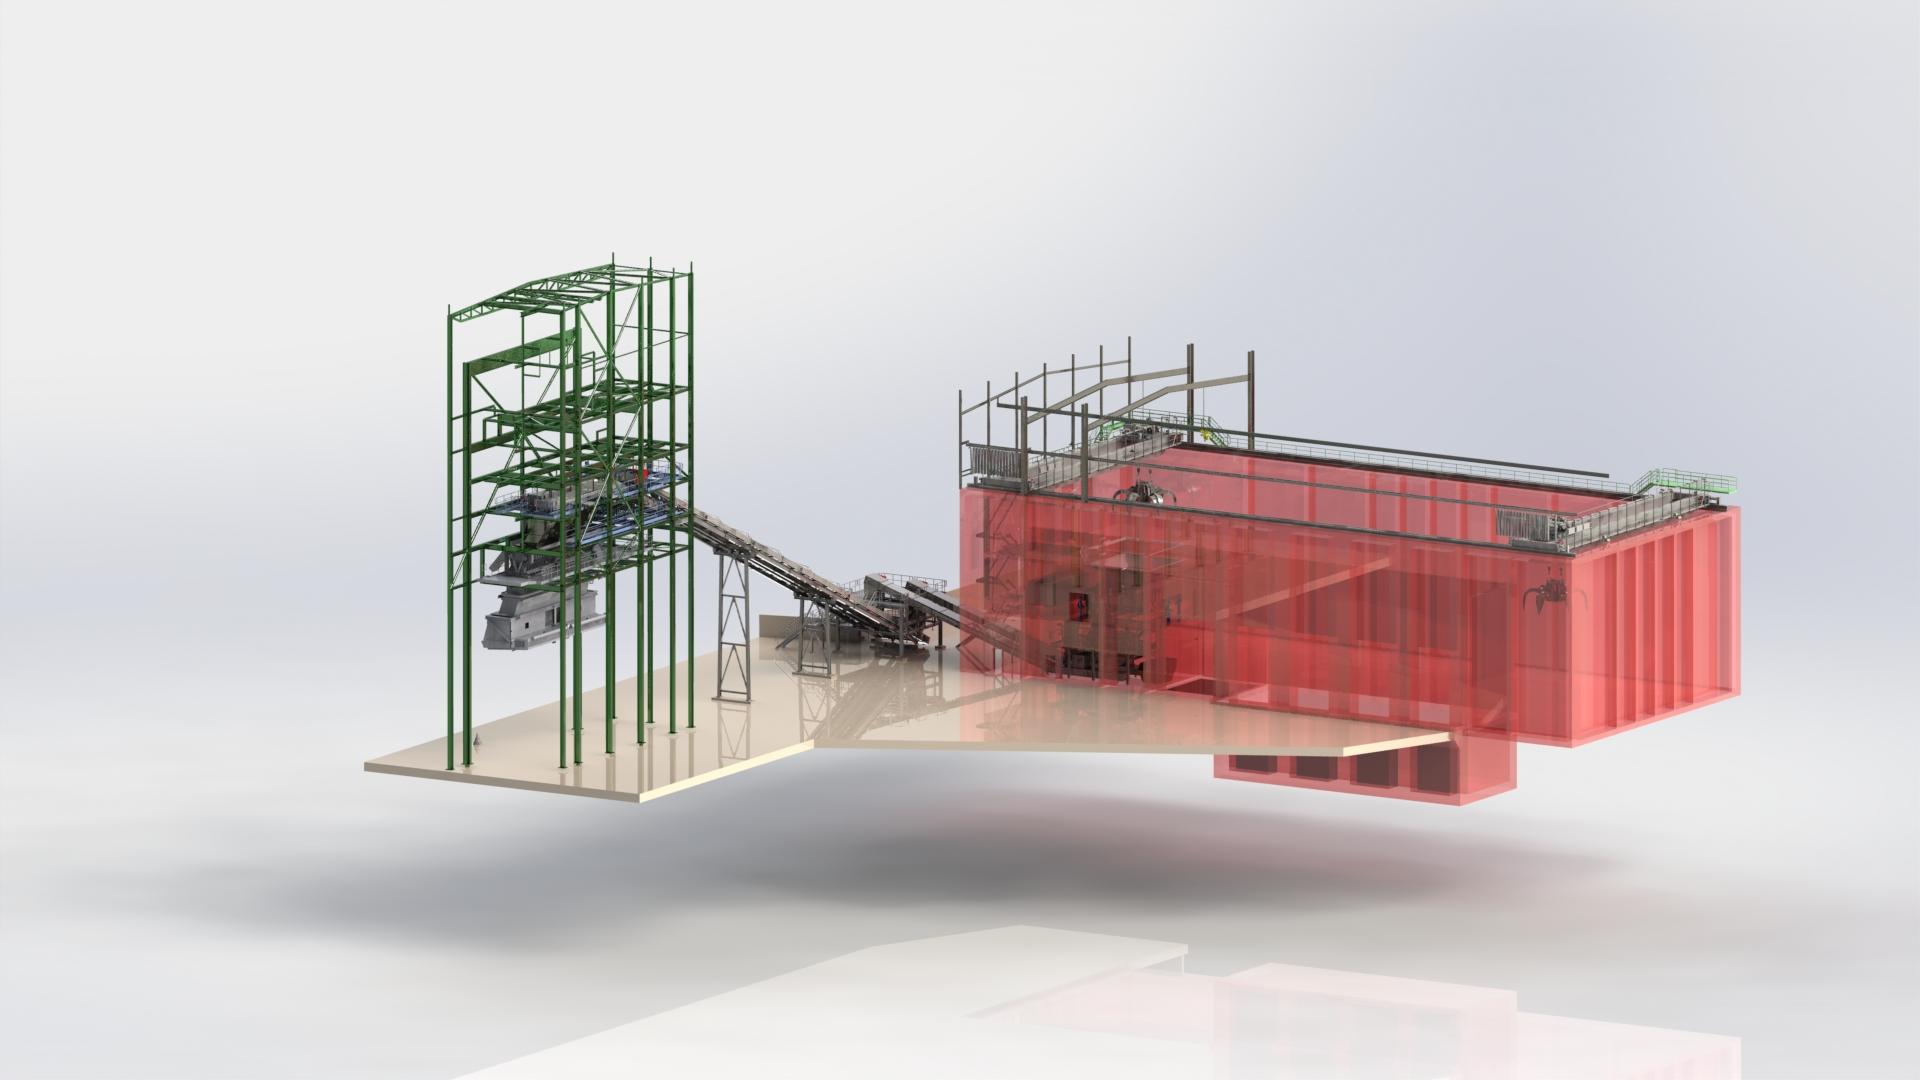 Margam, England; Biomasse-Förderanlage